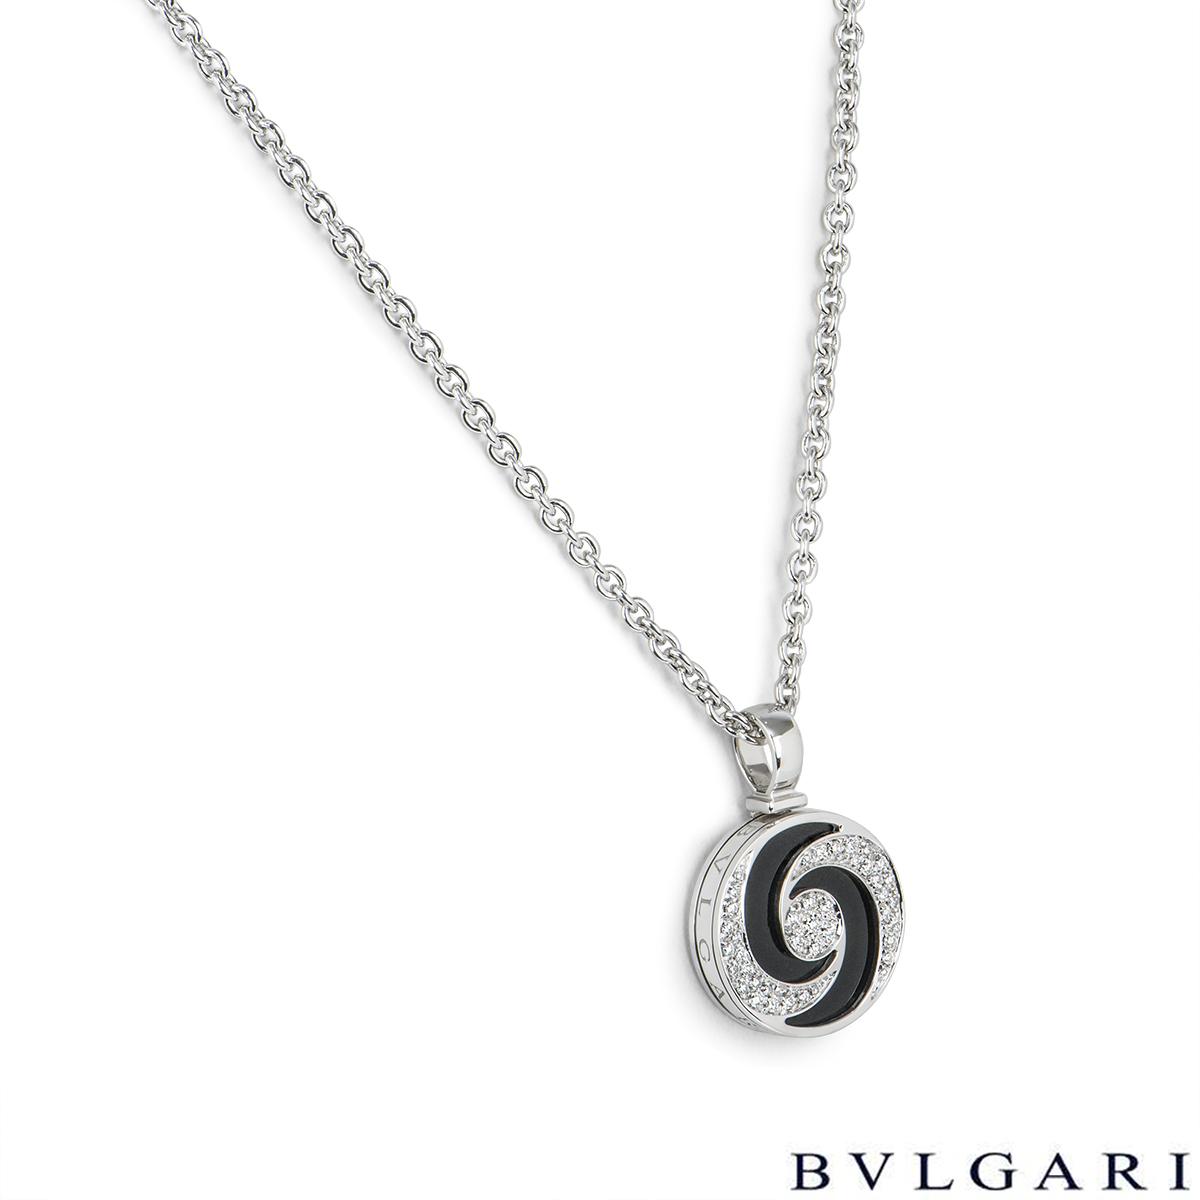 Bvlgari Optical Illusion Diamond & Onyx Spinning Pendant